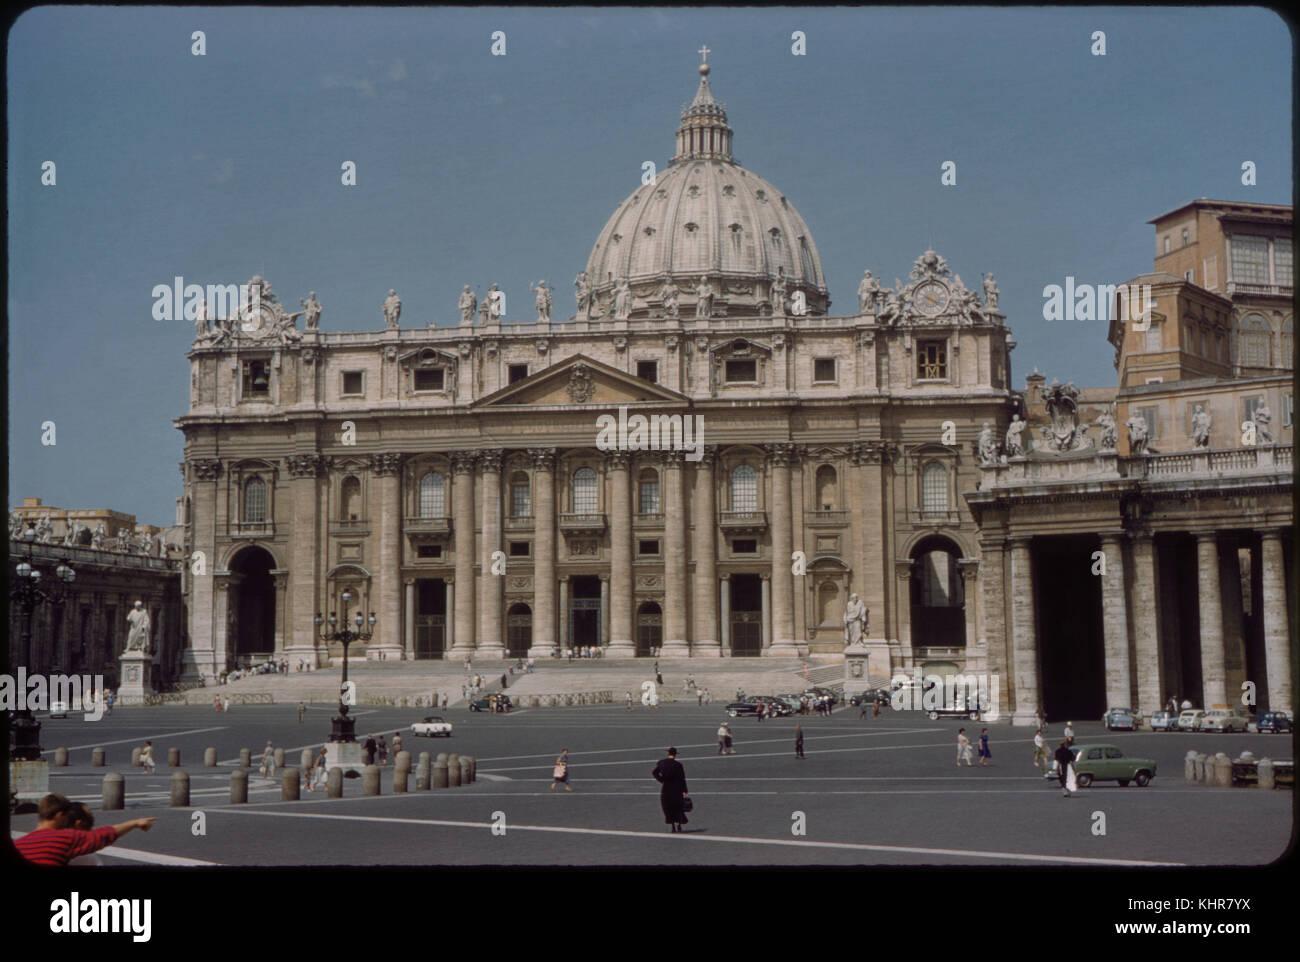 Saint Peter's Basilica, Vatican, Rome, Italy, 1962 - Stock Image